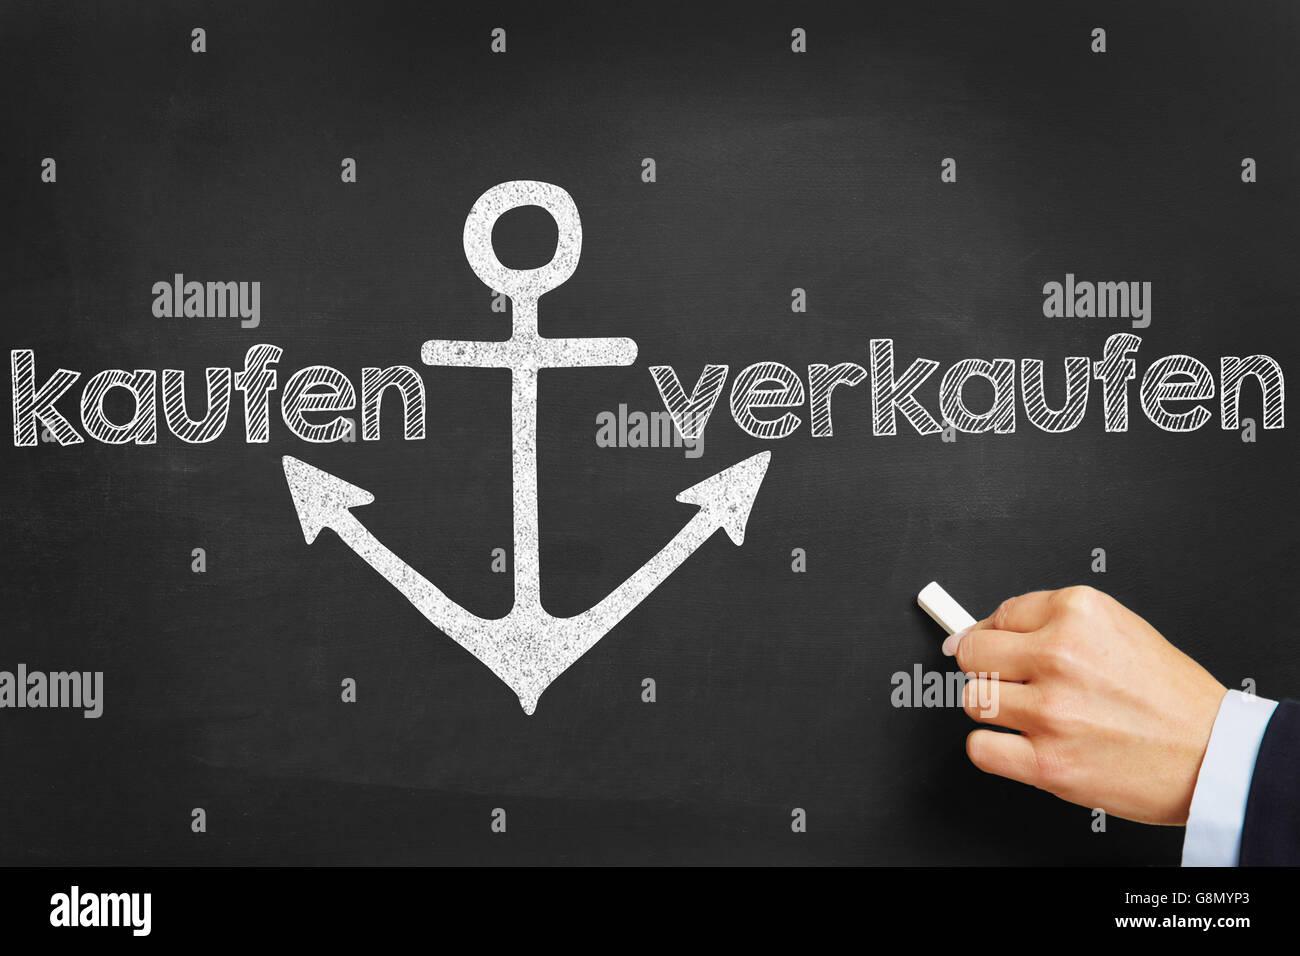 Hand writing the German words 'kaufen' (buy) and 'verkaufen' (sell) on blackboard - Stock Image